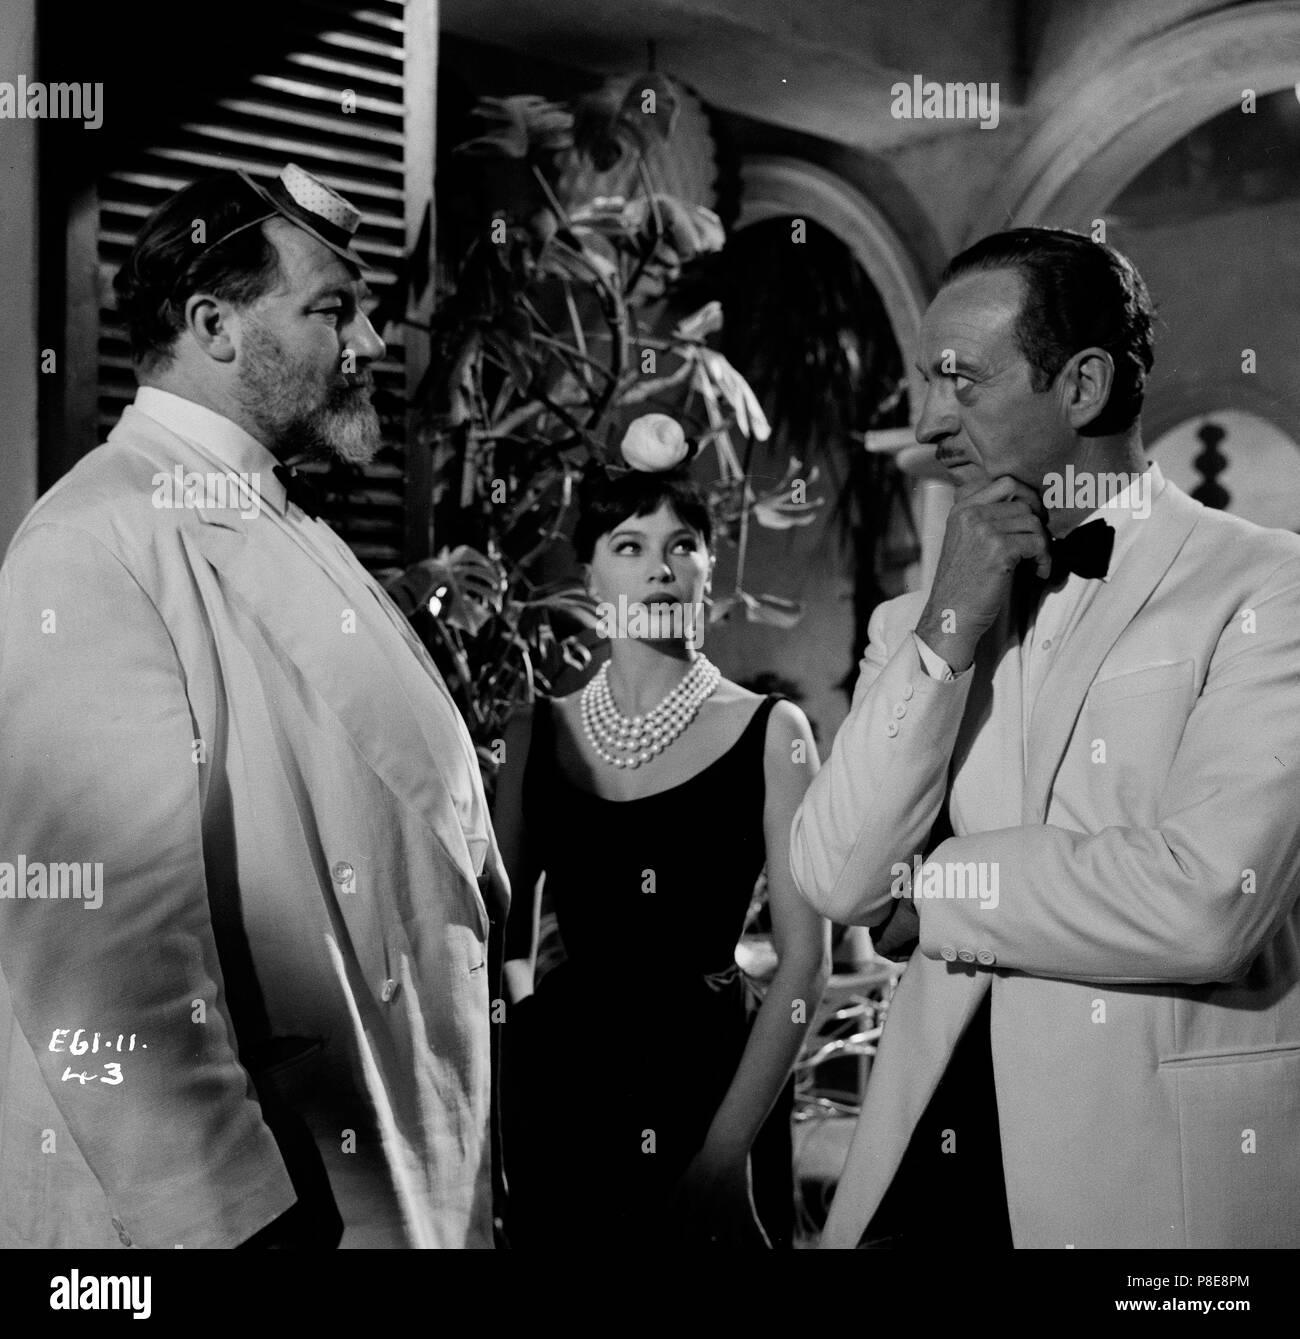 Guns of Darkness (1962) David Niven, Leslie Caron, James Robertson Justice,     Date: 1962 - Stock Image